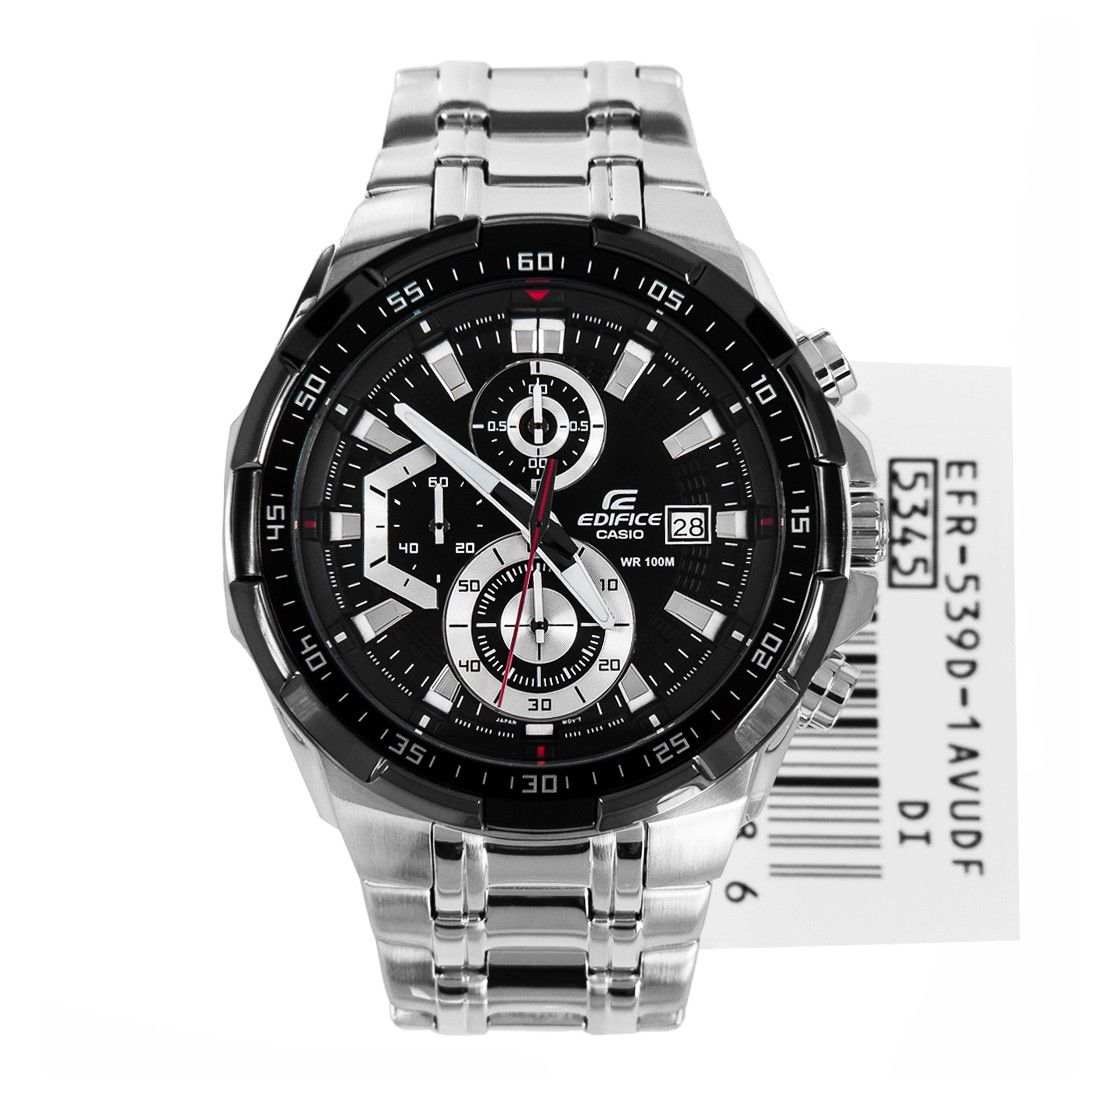 Casio Edifice Sports Watch EFR-539D-1AV EFR539D